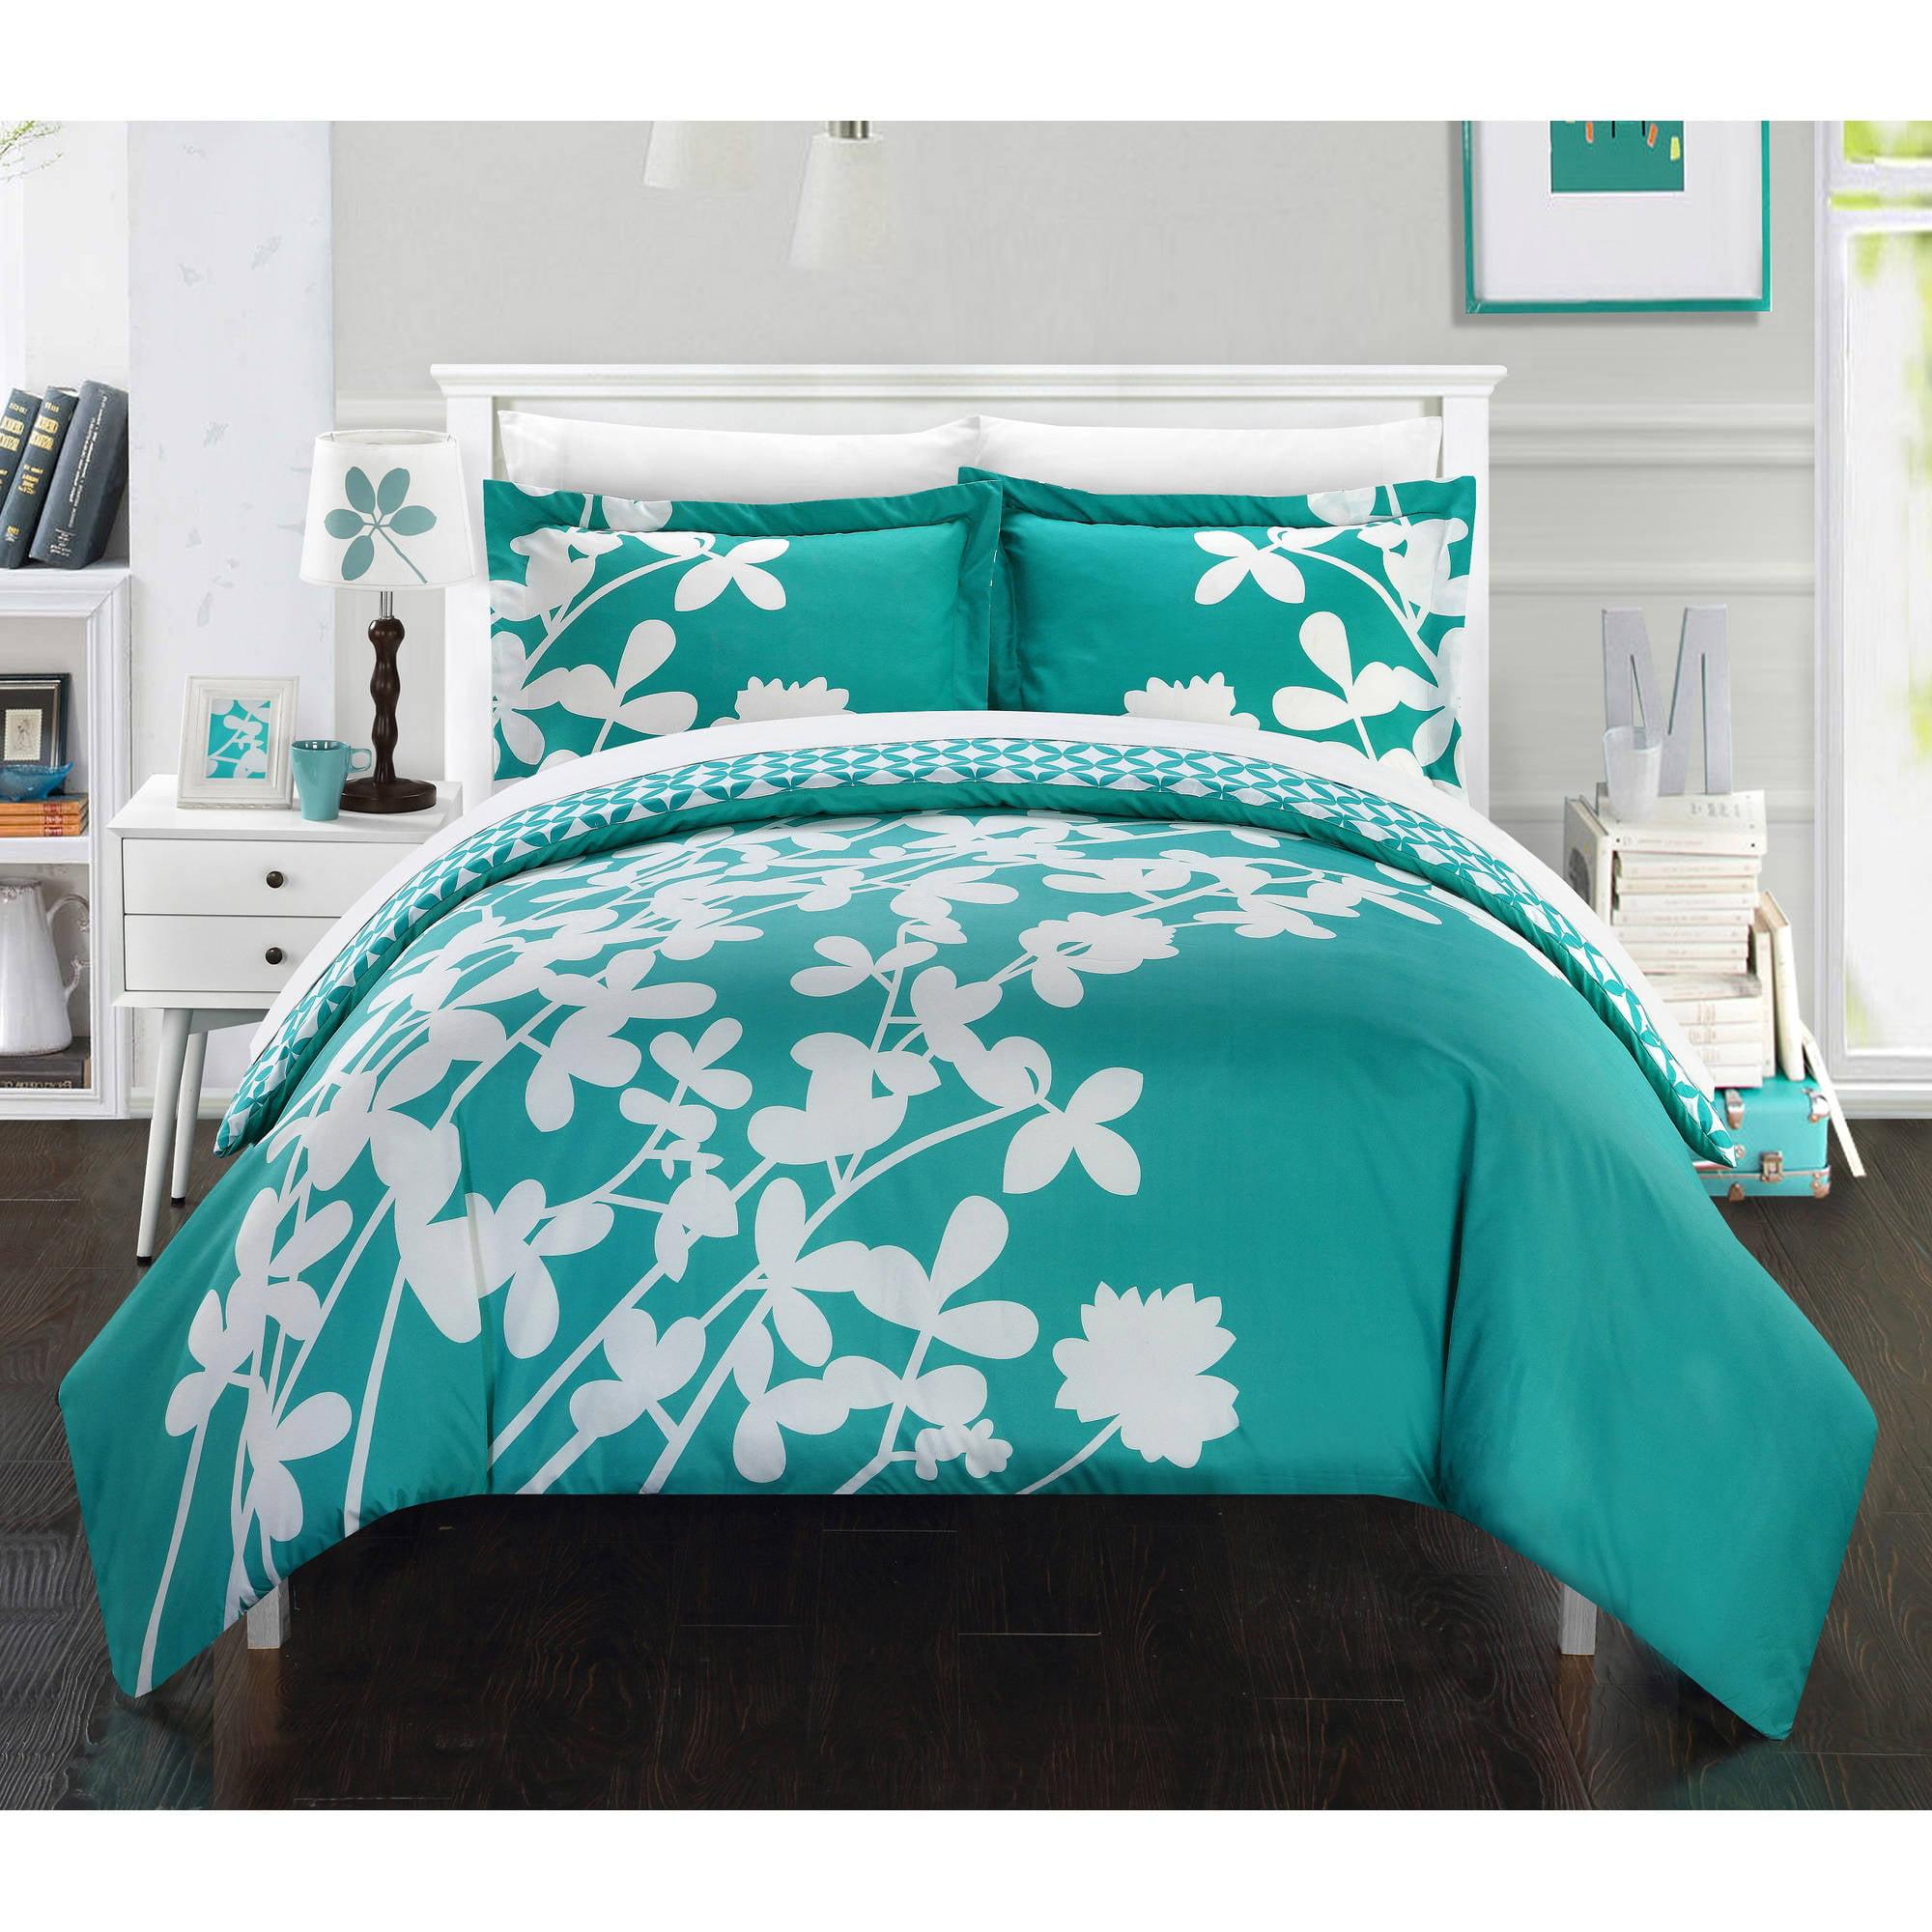 Walmart Com Bedroom Furniture: Casa Blanca 7-Piece Bedding Duvet Cover Set